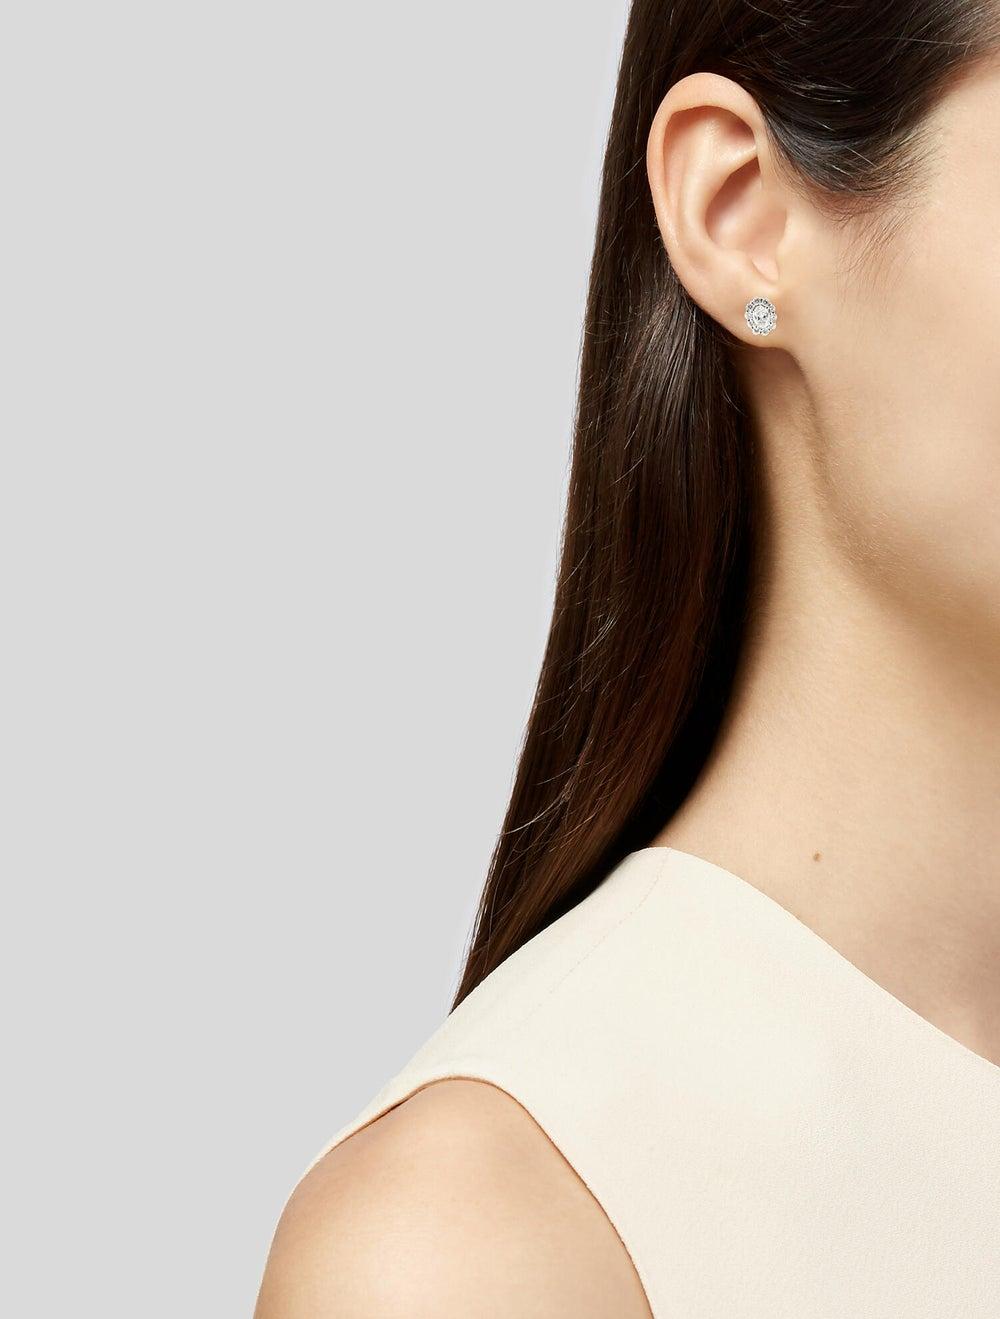 Earrings 14K Diamond Halo Stud Earrings White - image 2